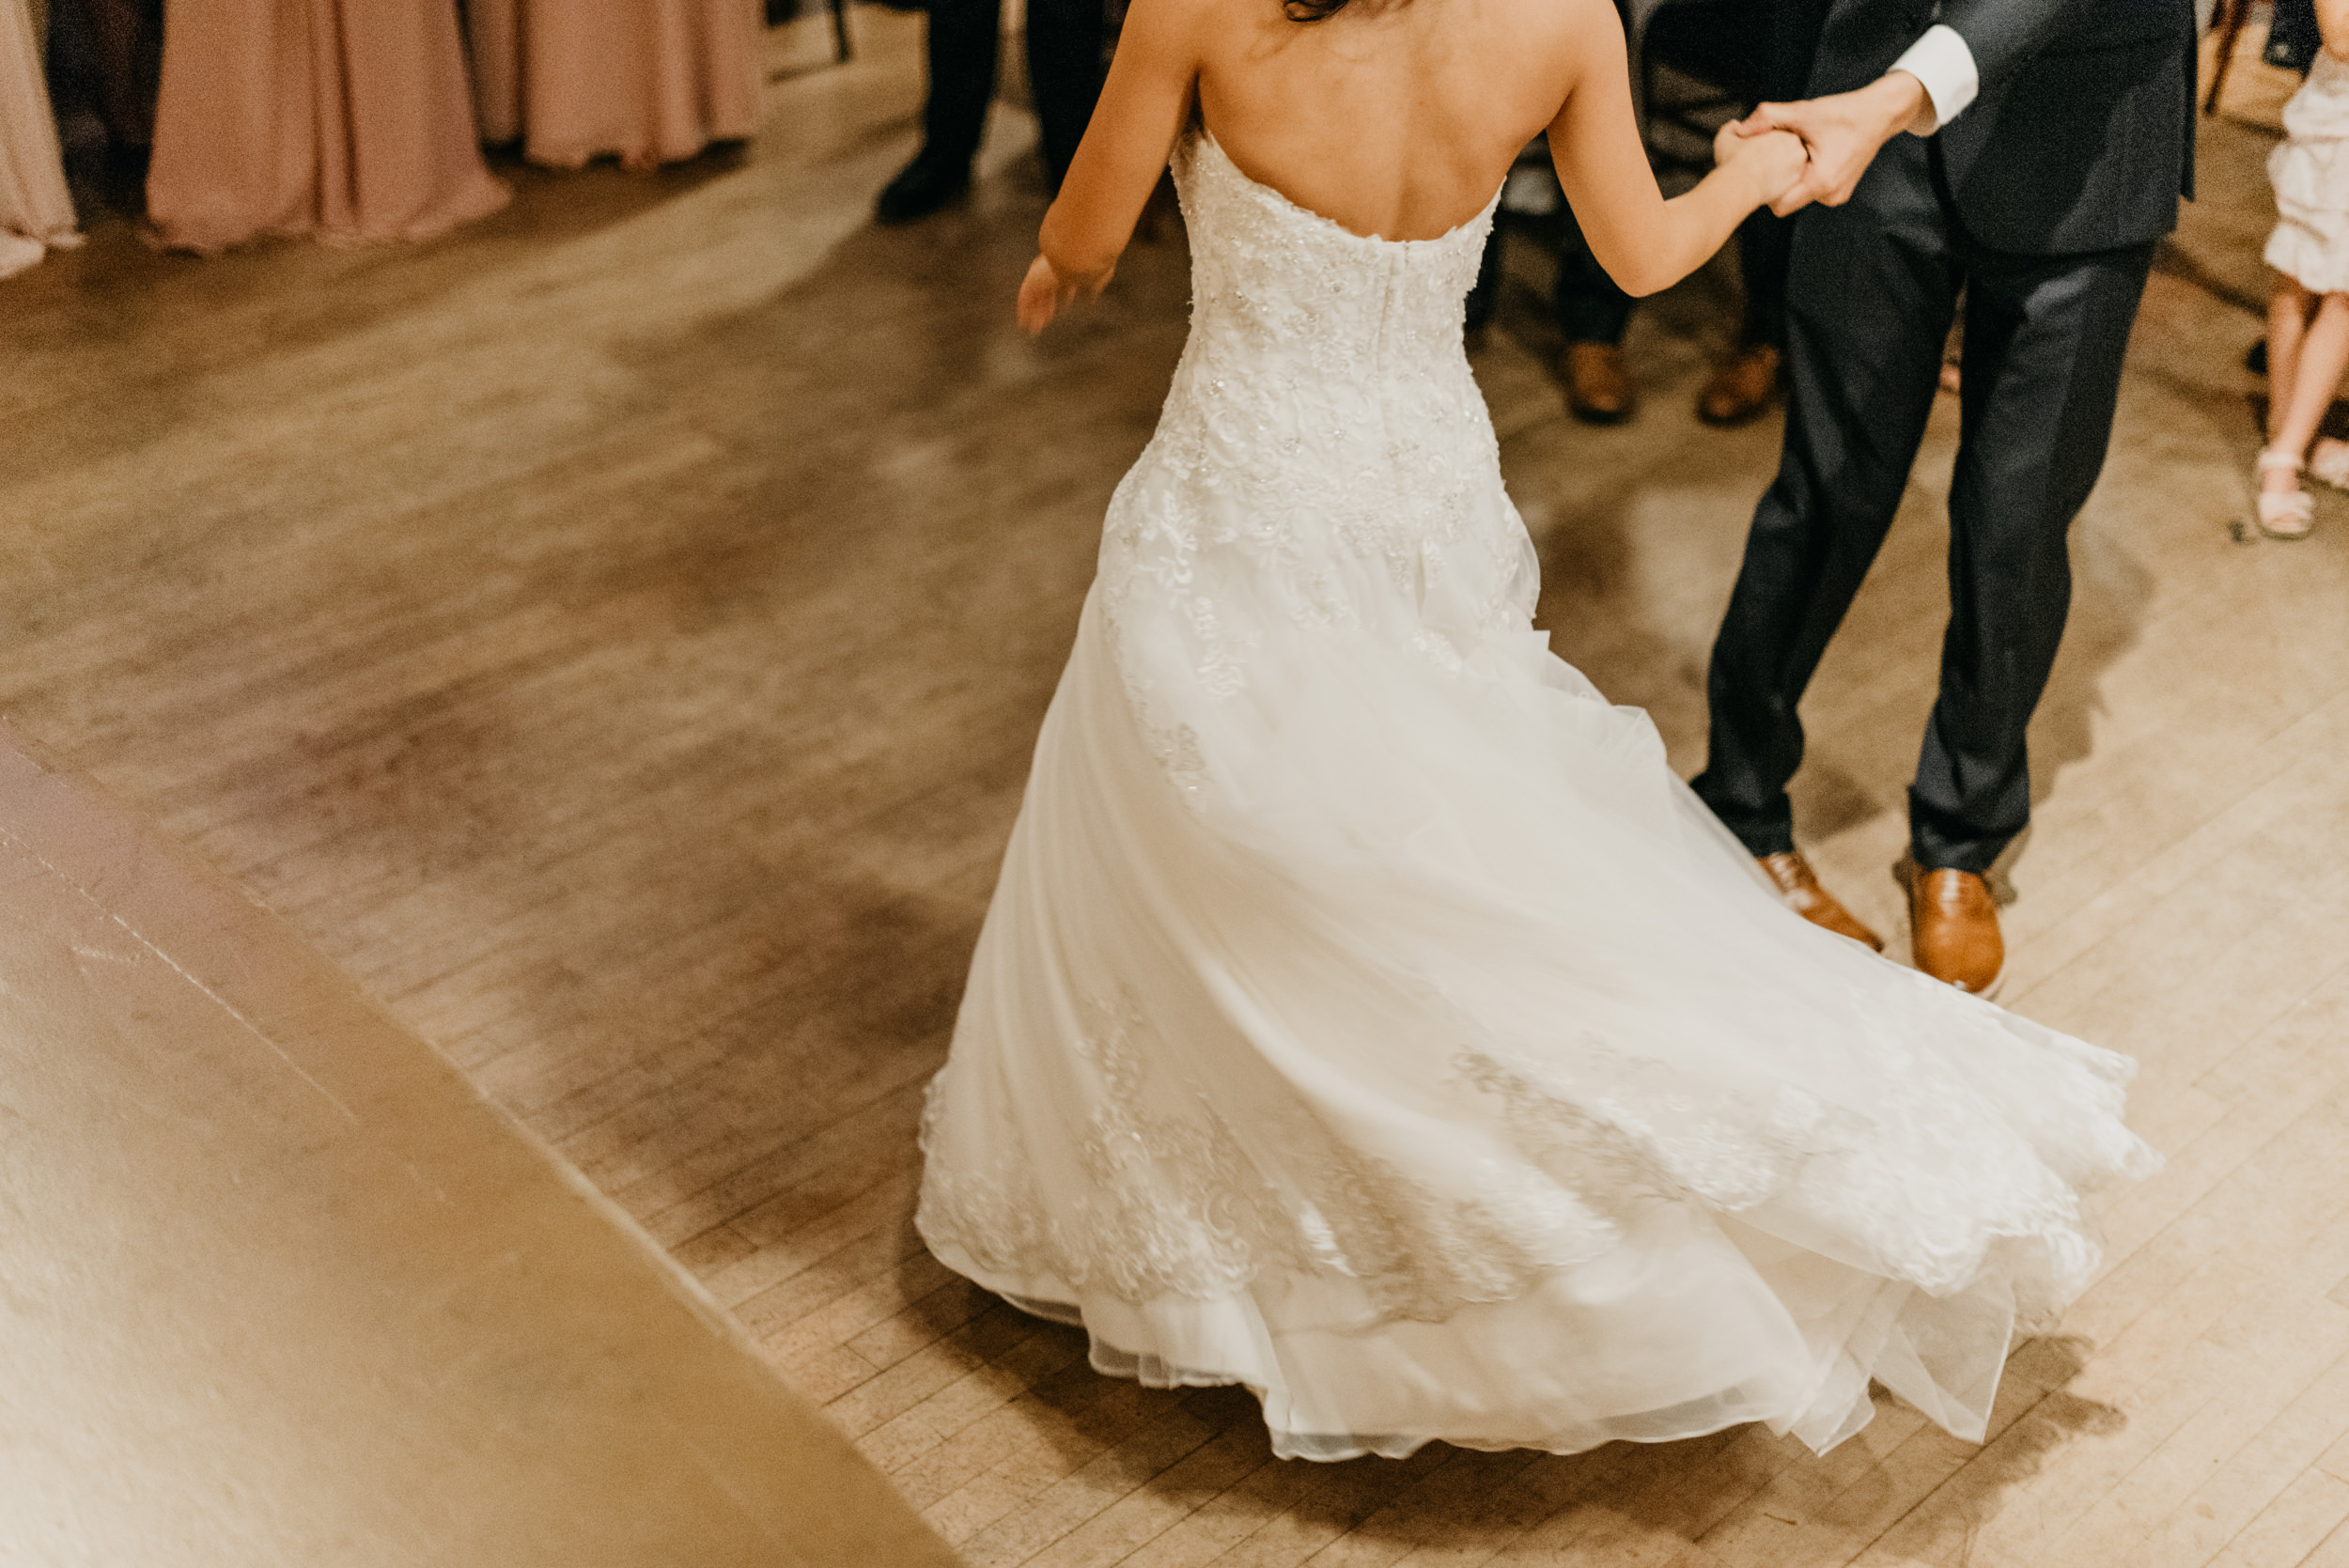 122-reception-west-end-ballroom-portland-wedding-photographer-9890.jpg